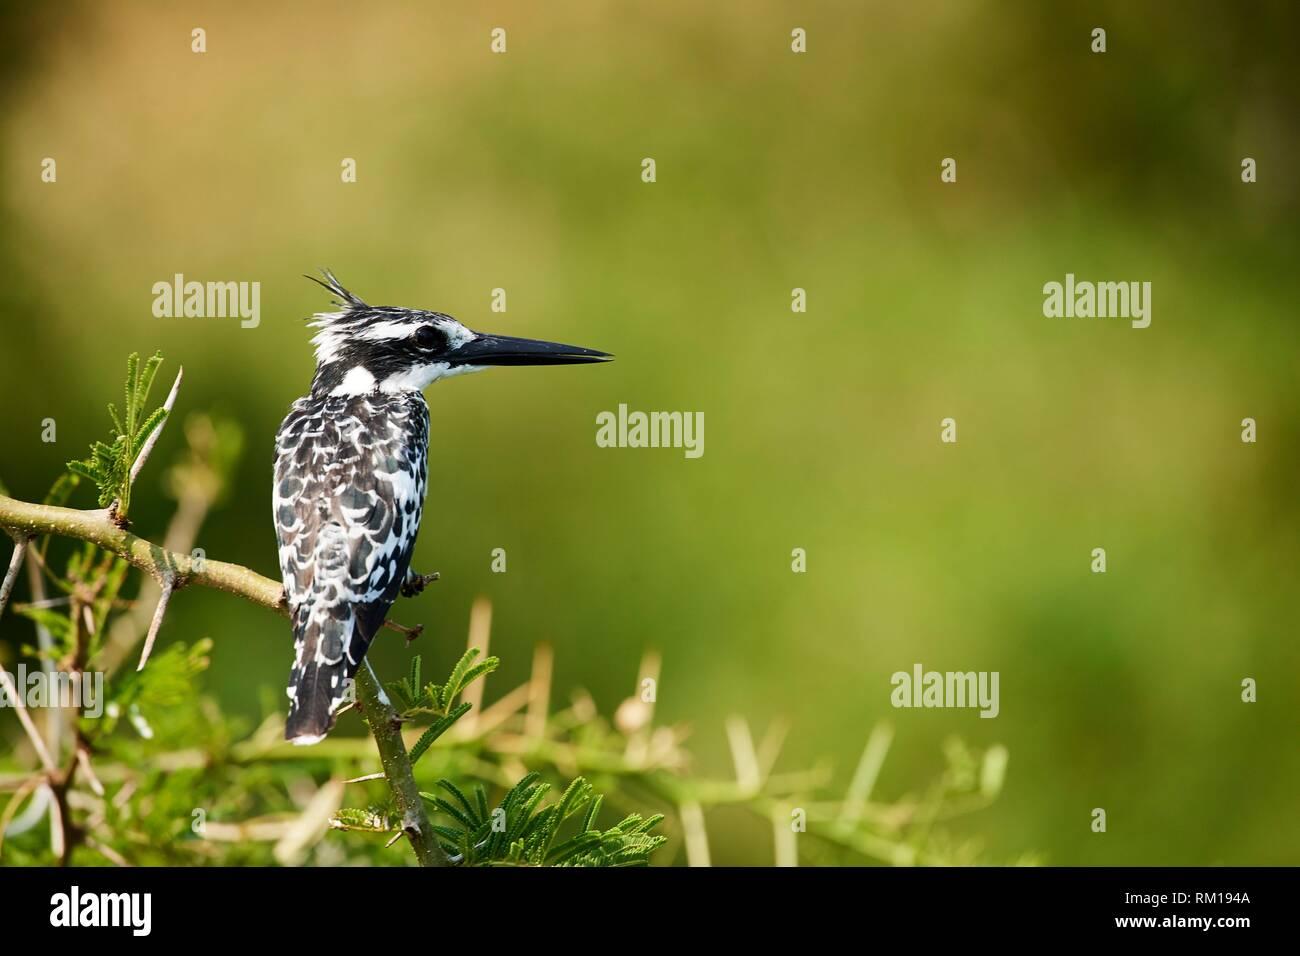 Pied Kingfisher (Ceryle rudis) appollaiato su un ramo. Queen Elizabeth National Park, Uganda, Africa. Immagini Stock